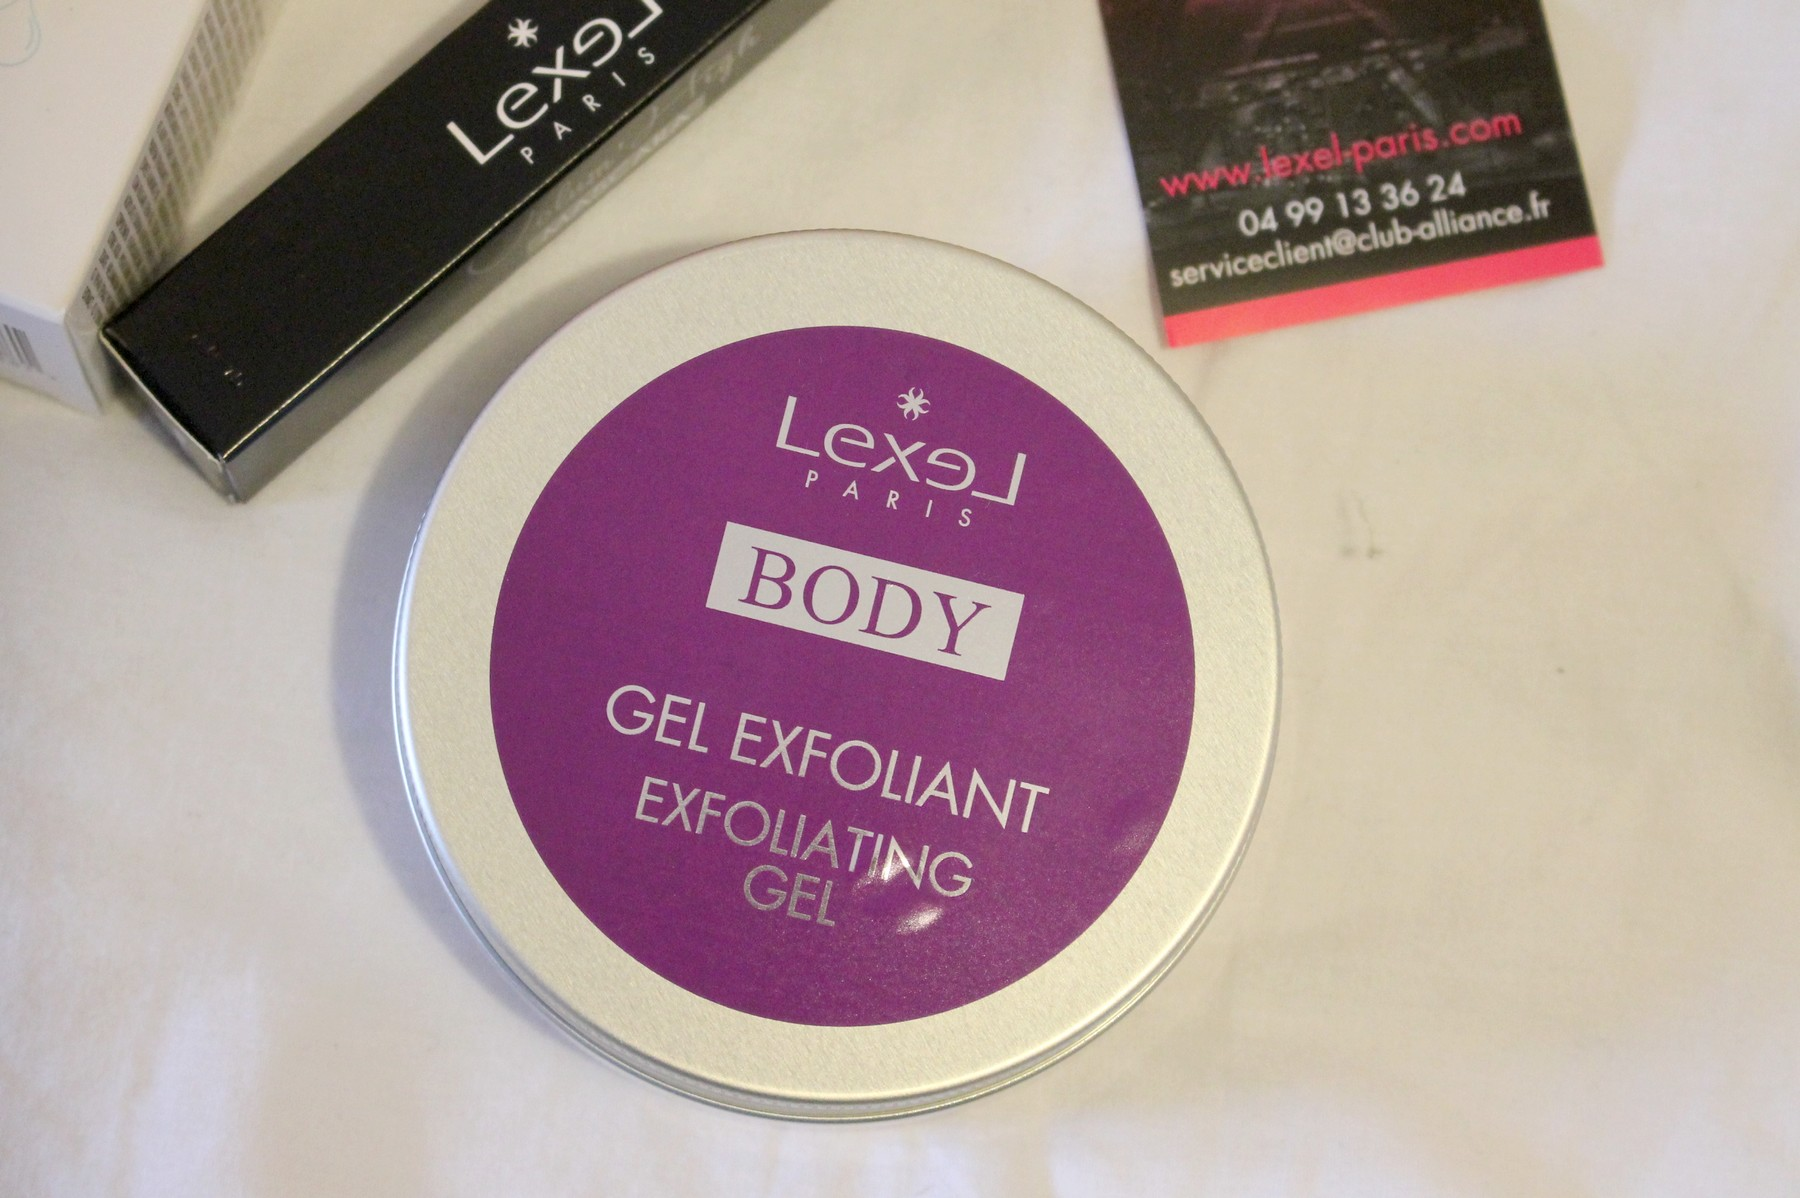 lexel4